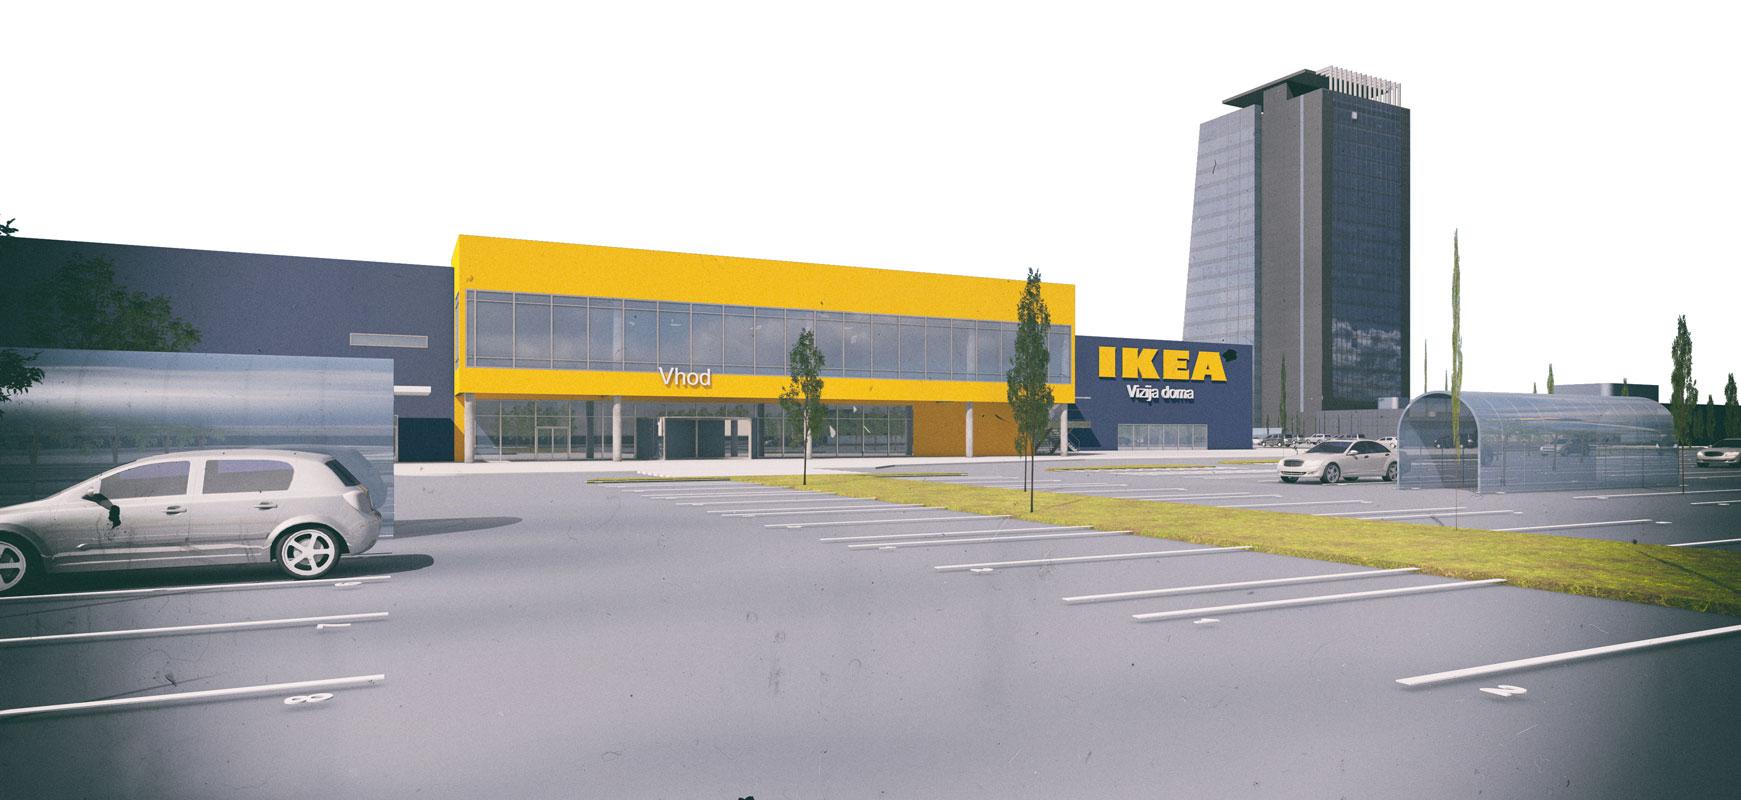 Trgovski objekt IKEA, Ljubljana